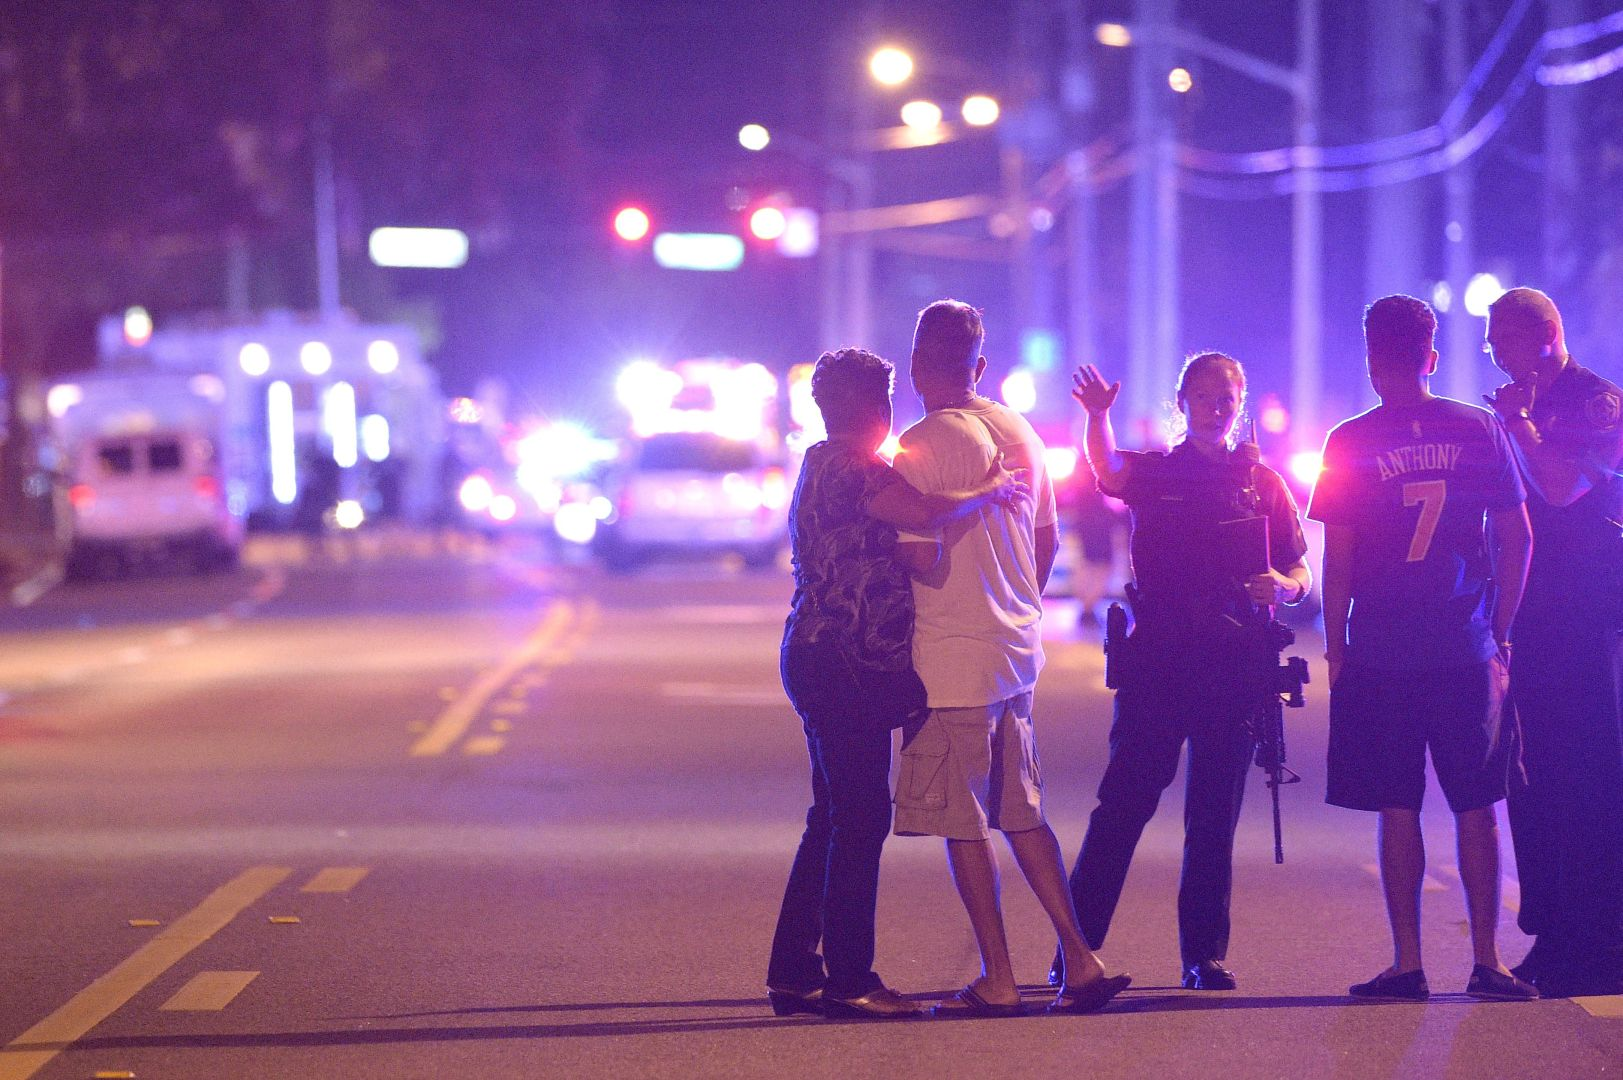 Orlando-shooting-06.12.16.jpg